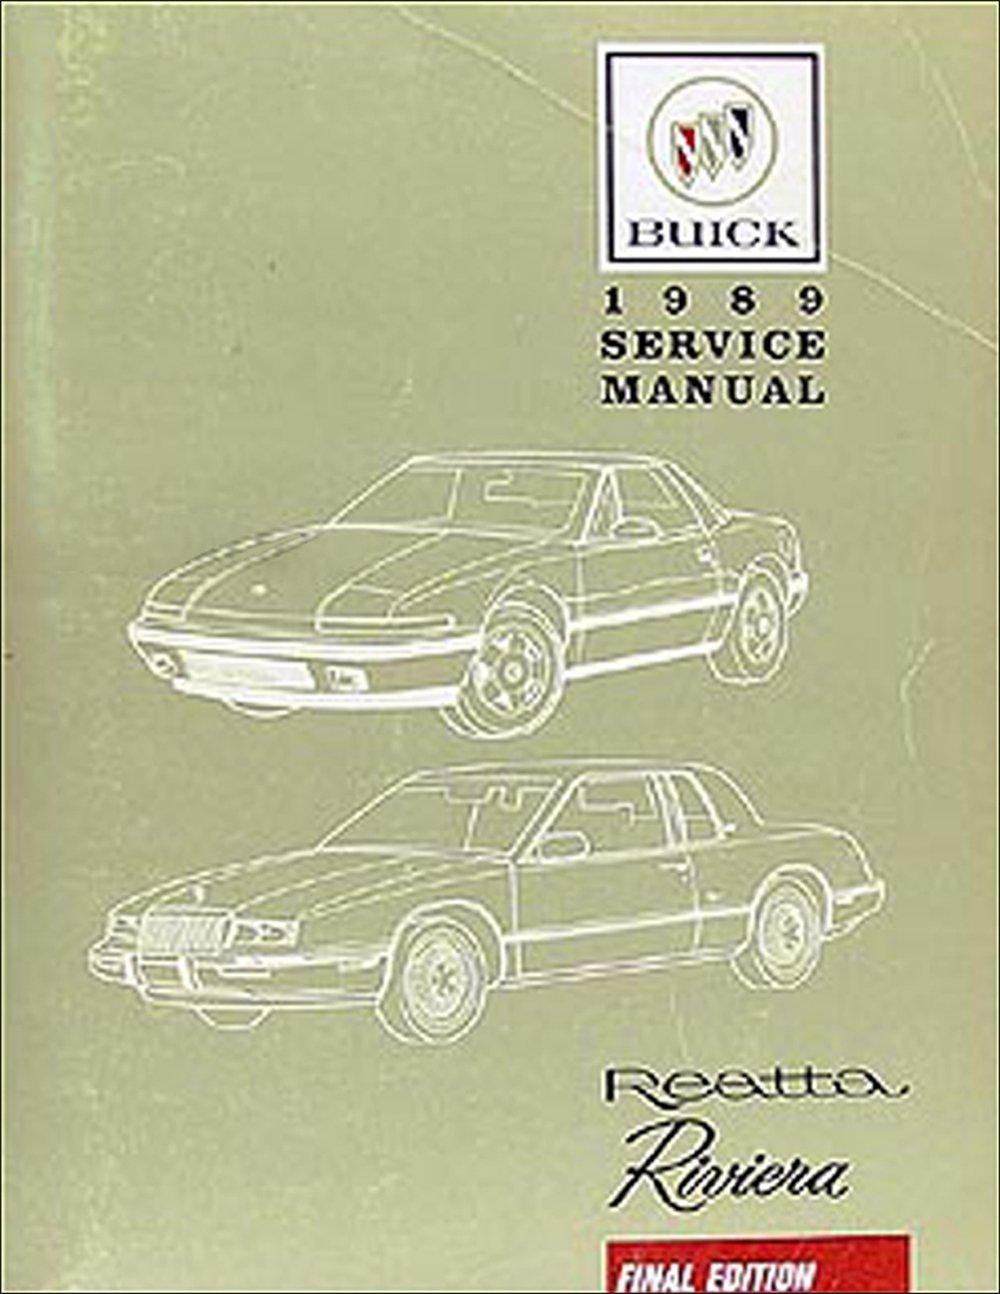 1989 buick riviera reatta repair shop manual original buick 1989 buick riviera reatta repair shop manual original buick amazon books publicscrutiny Images